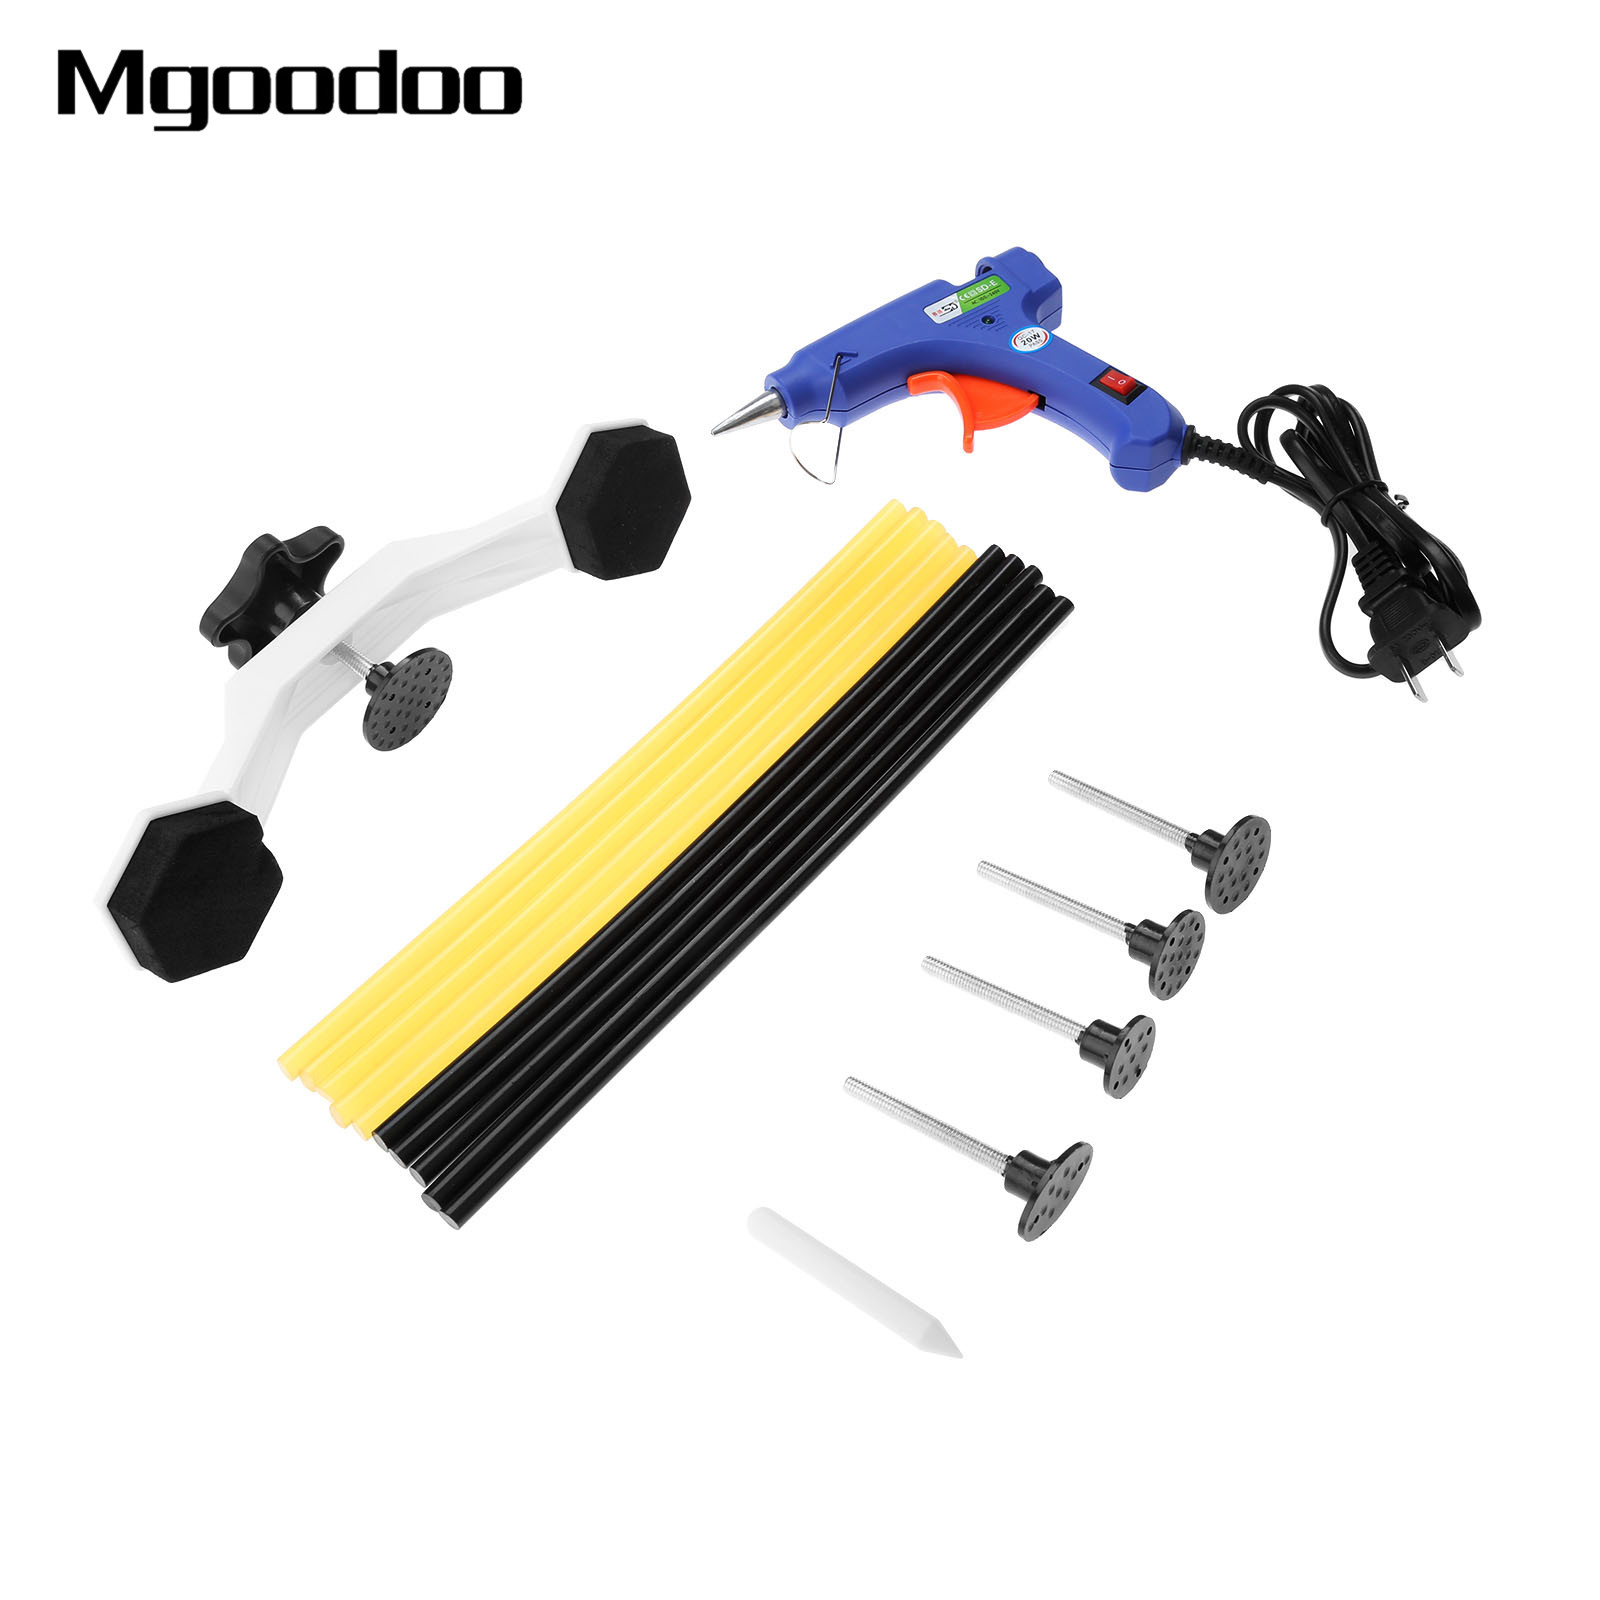 PDR Tools Pops a Dent Repair Bridge Dent Puller Kit with Hot Melt Glue Gun Pro PDR Glue Sticks for Auto Car Body Dent Repair